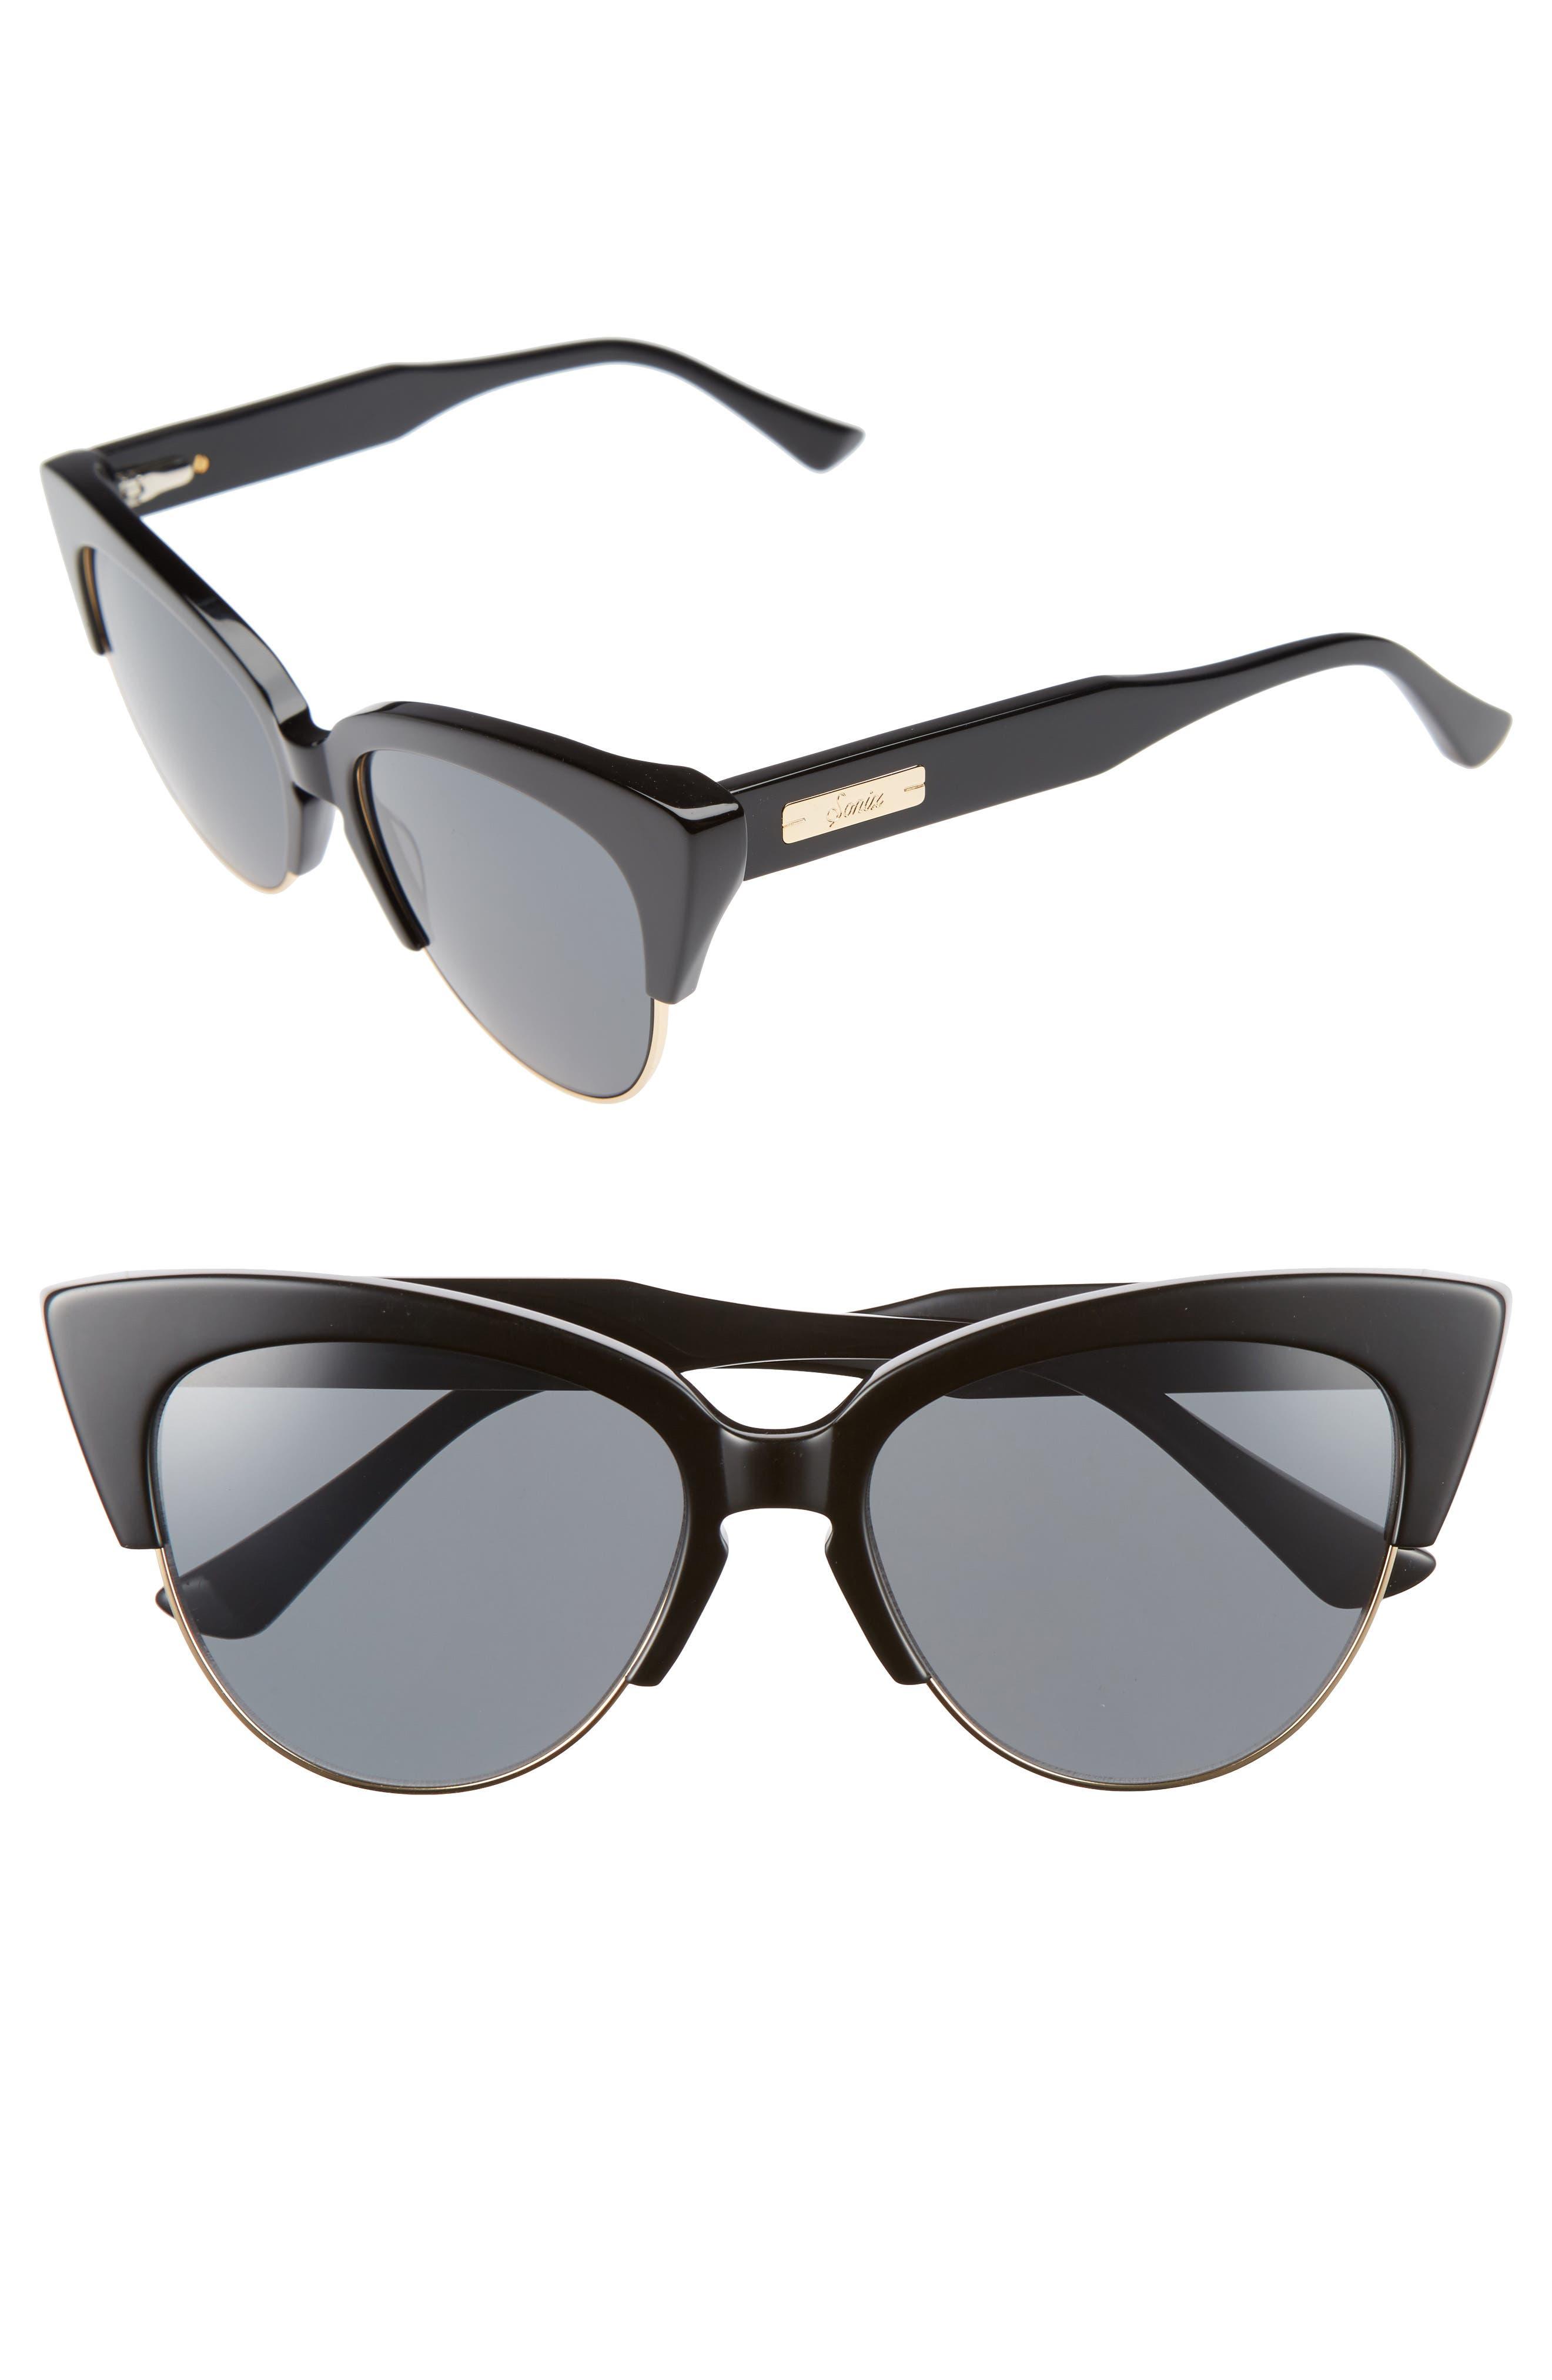 SONIX, Dafni 56mm Gradient Cat Eye Sunglasses, Main thumbnail 1, color, 001